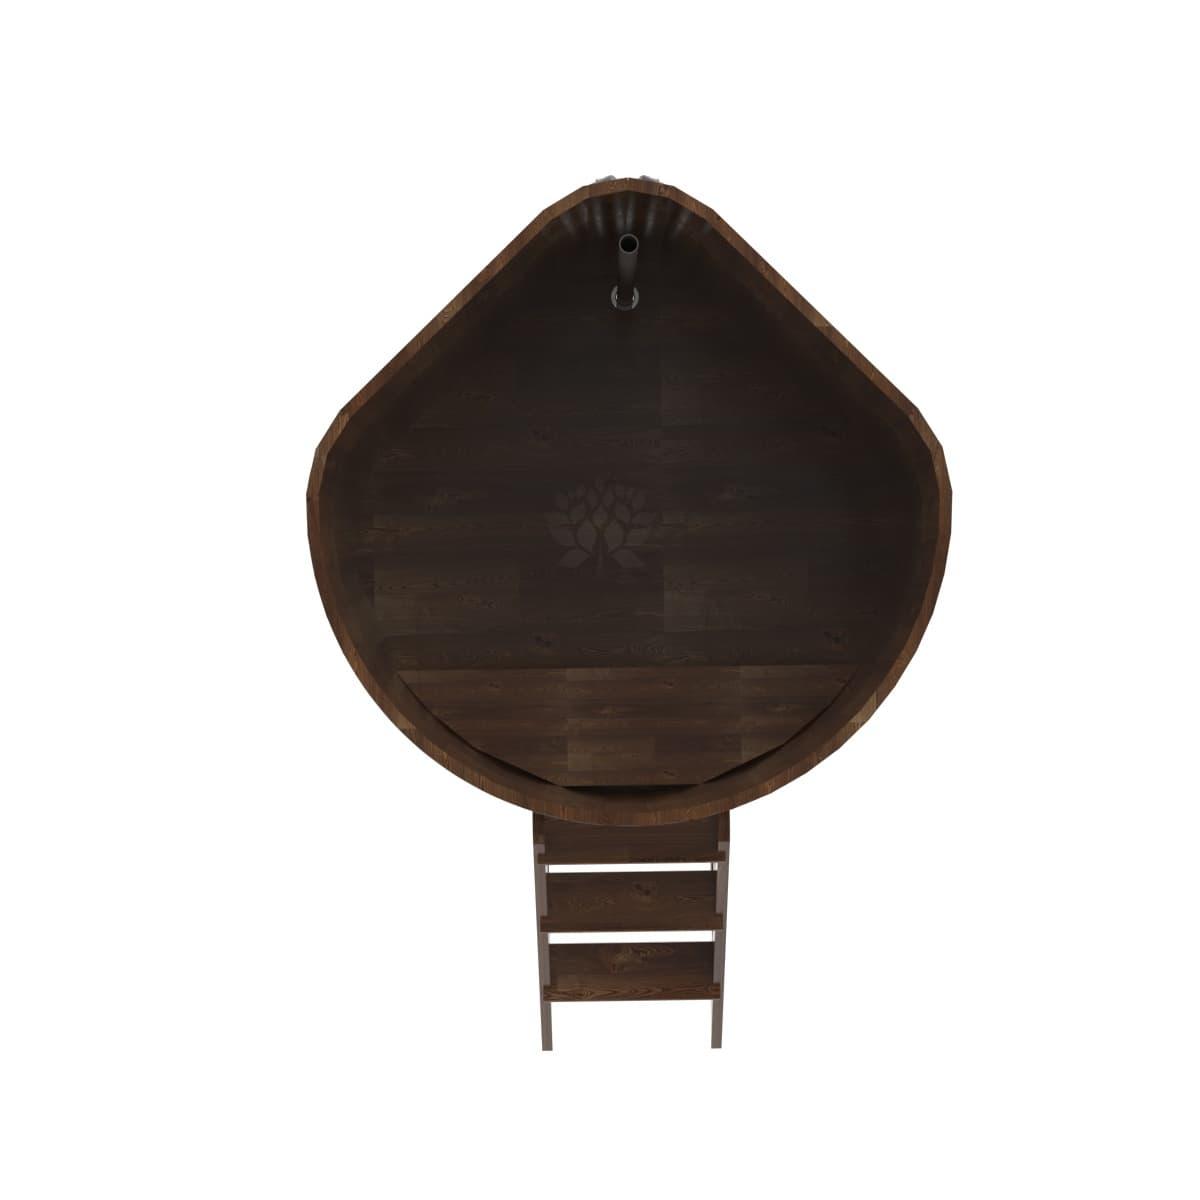 Купель угловая из сращенных ламелей лиственницы BentWood 1,31х1,31